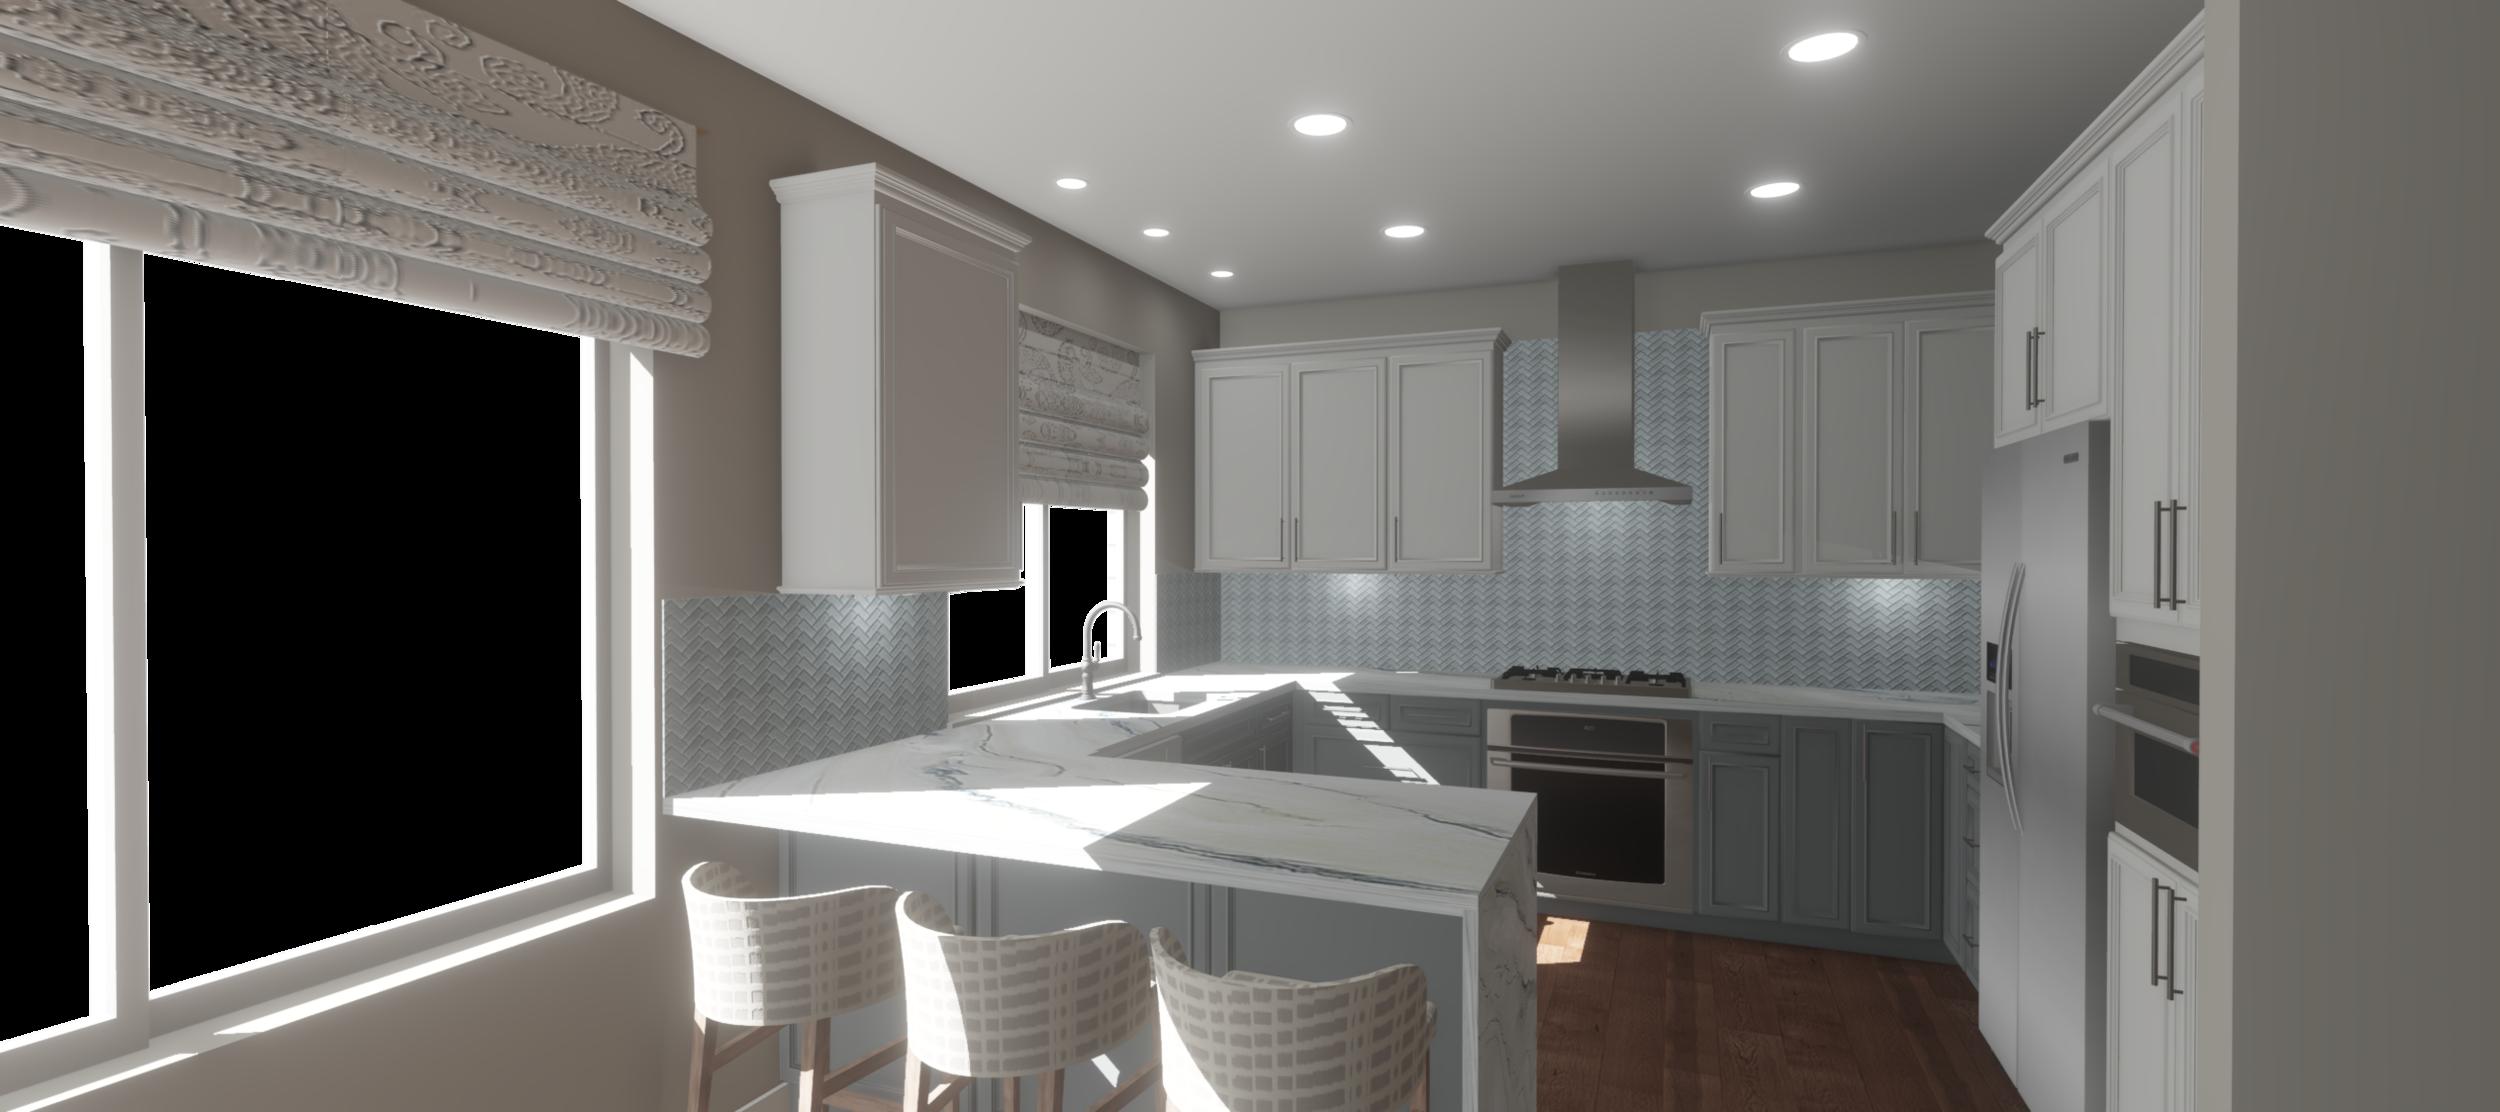 An Interior Designer S Guide To Home Designer Pro Vs Chief Architect Interiors Kelly Fridline Design Llc